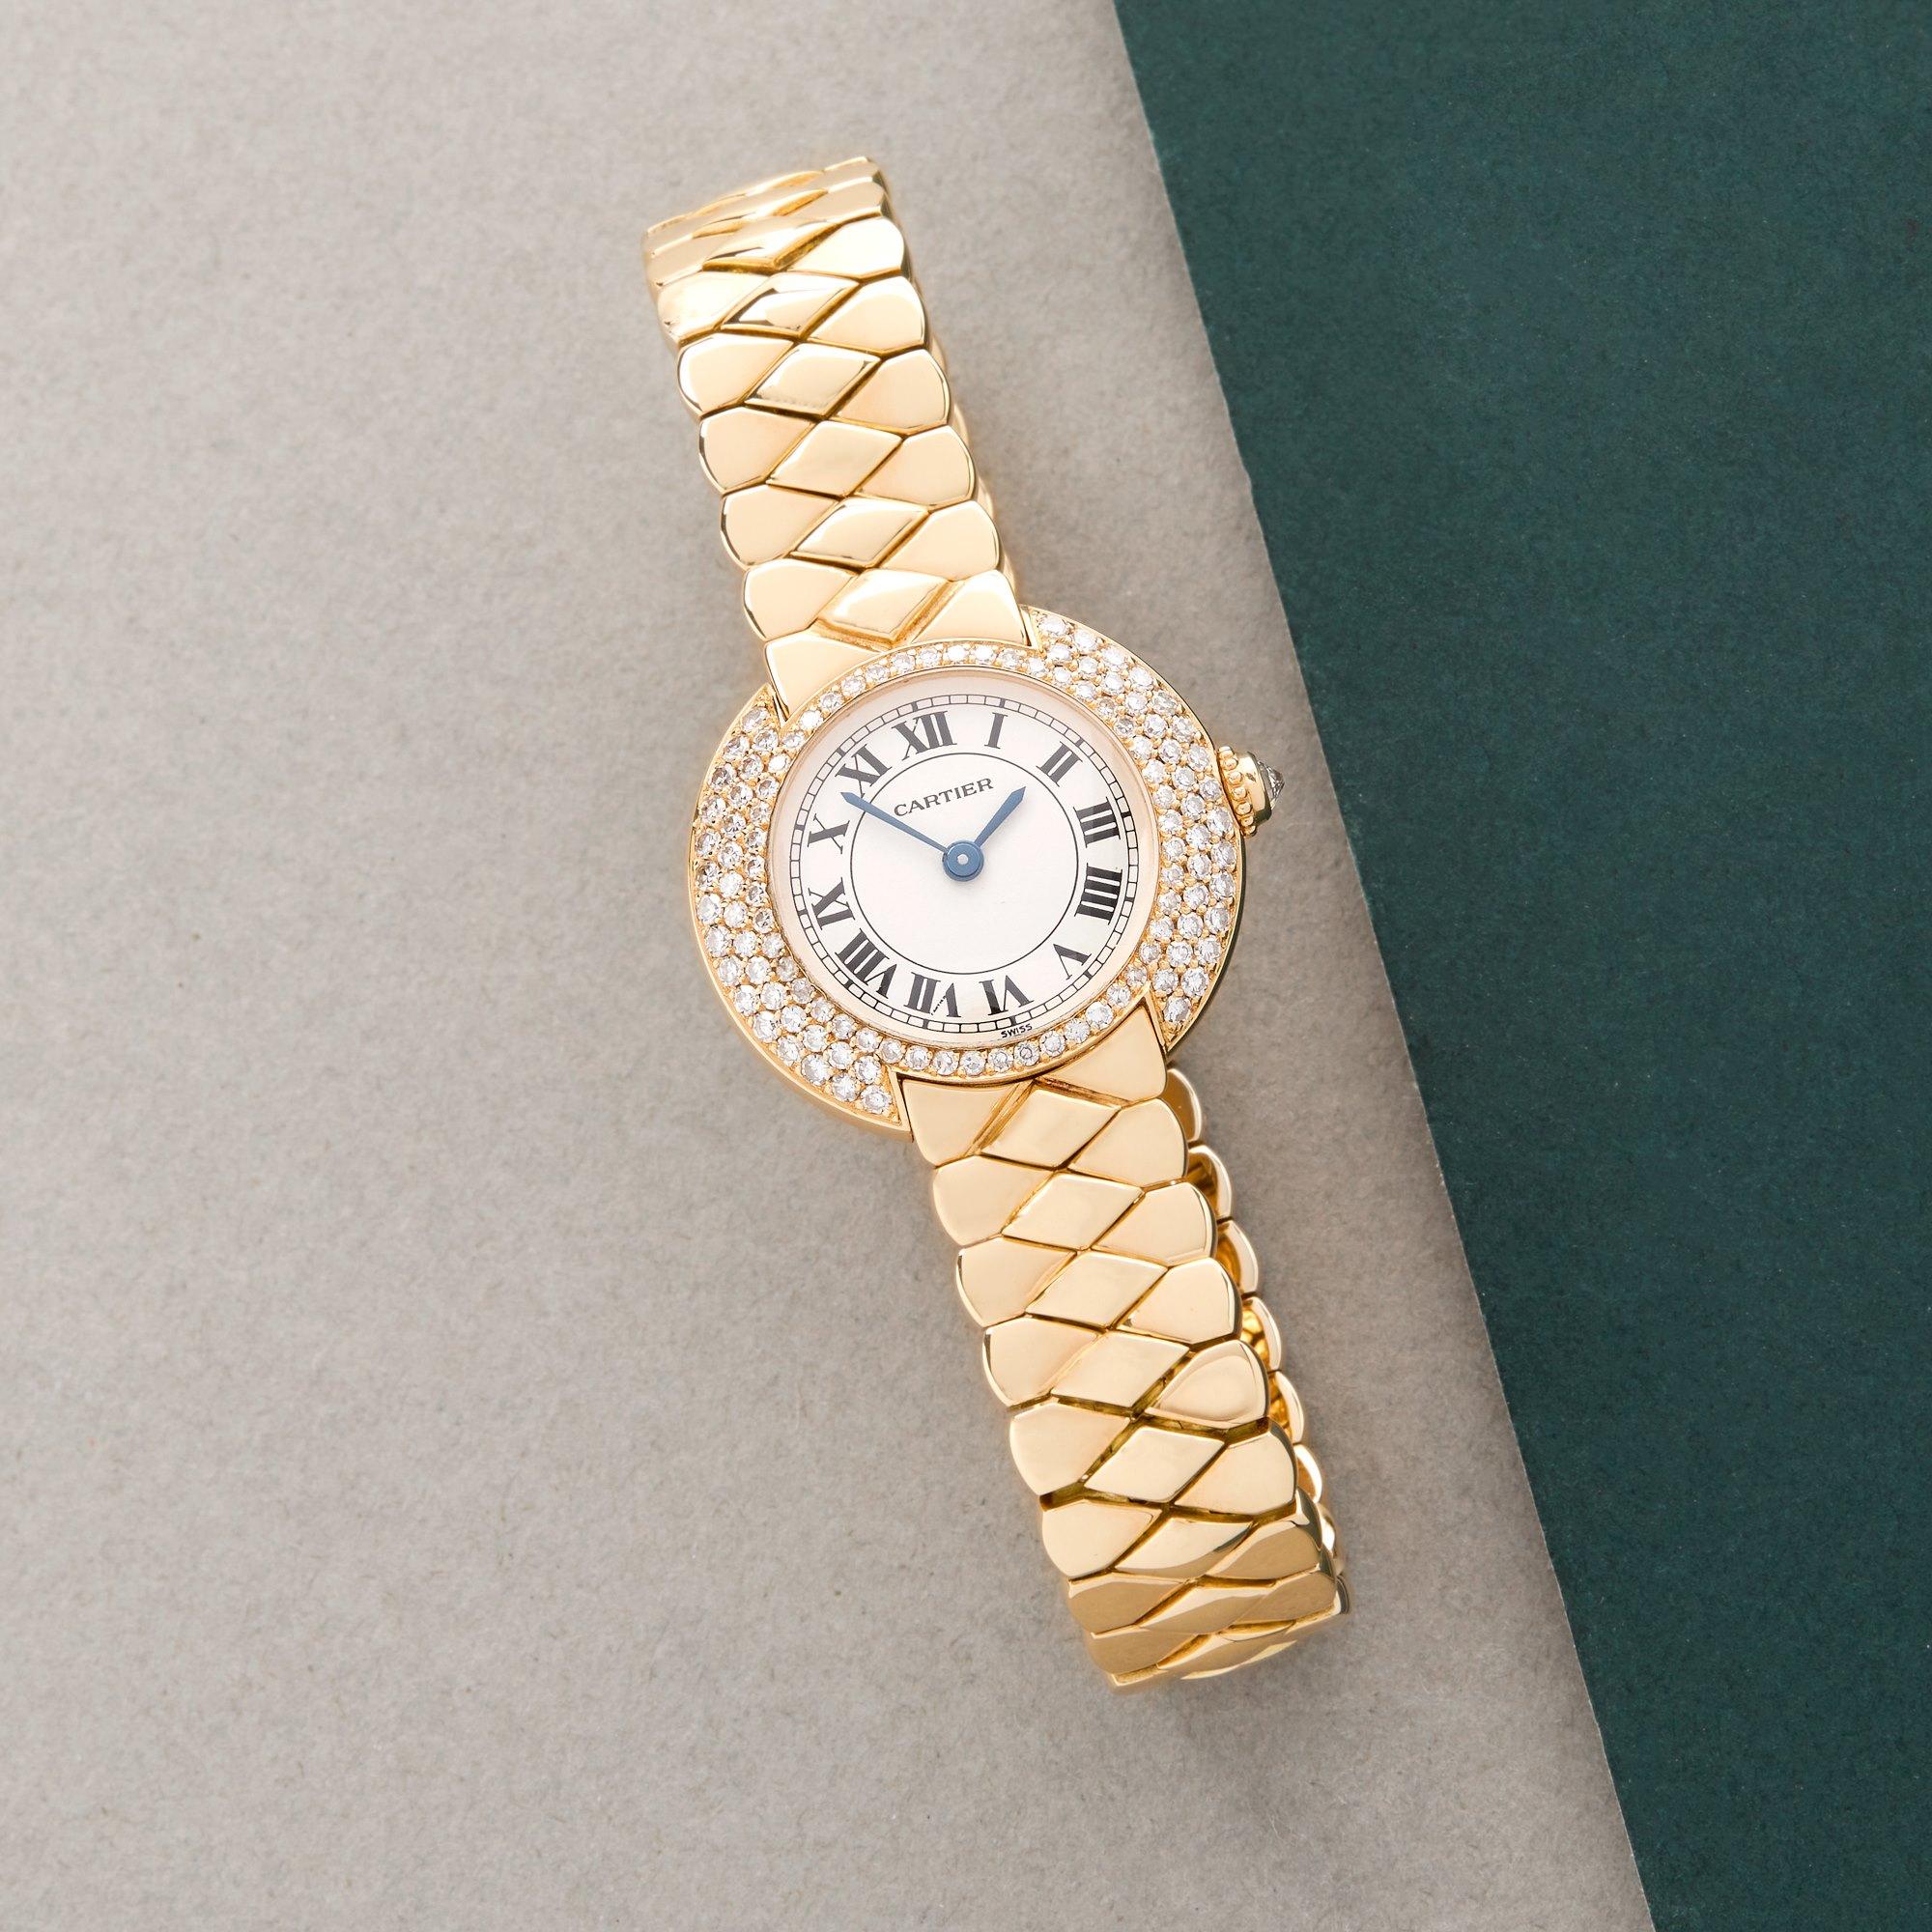 Cartier Vendome Diamond 18K Yellow Gold W15071G8 or 1292